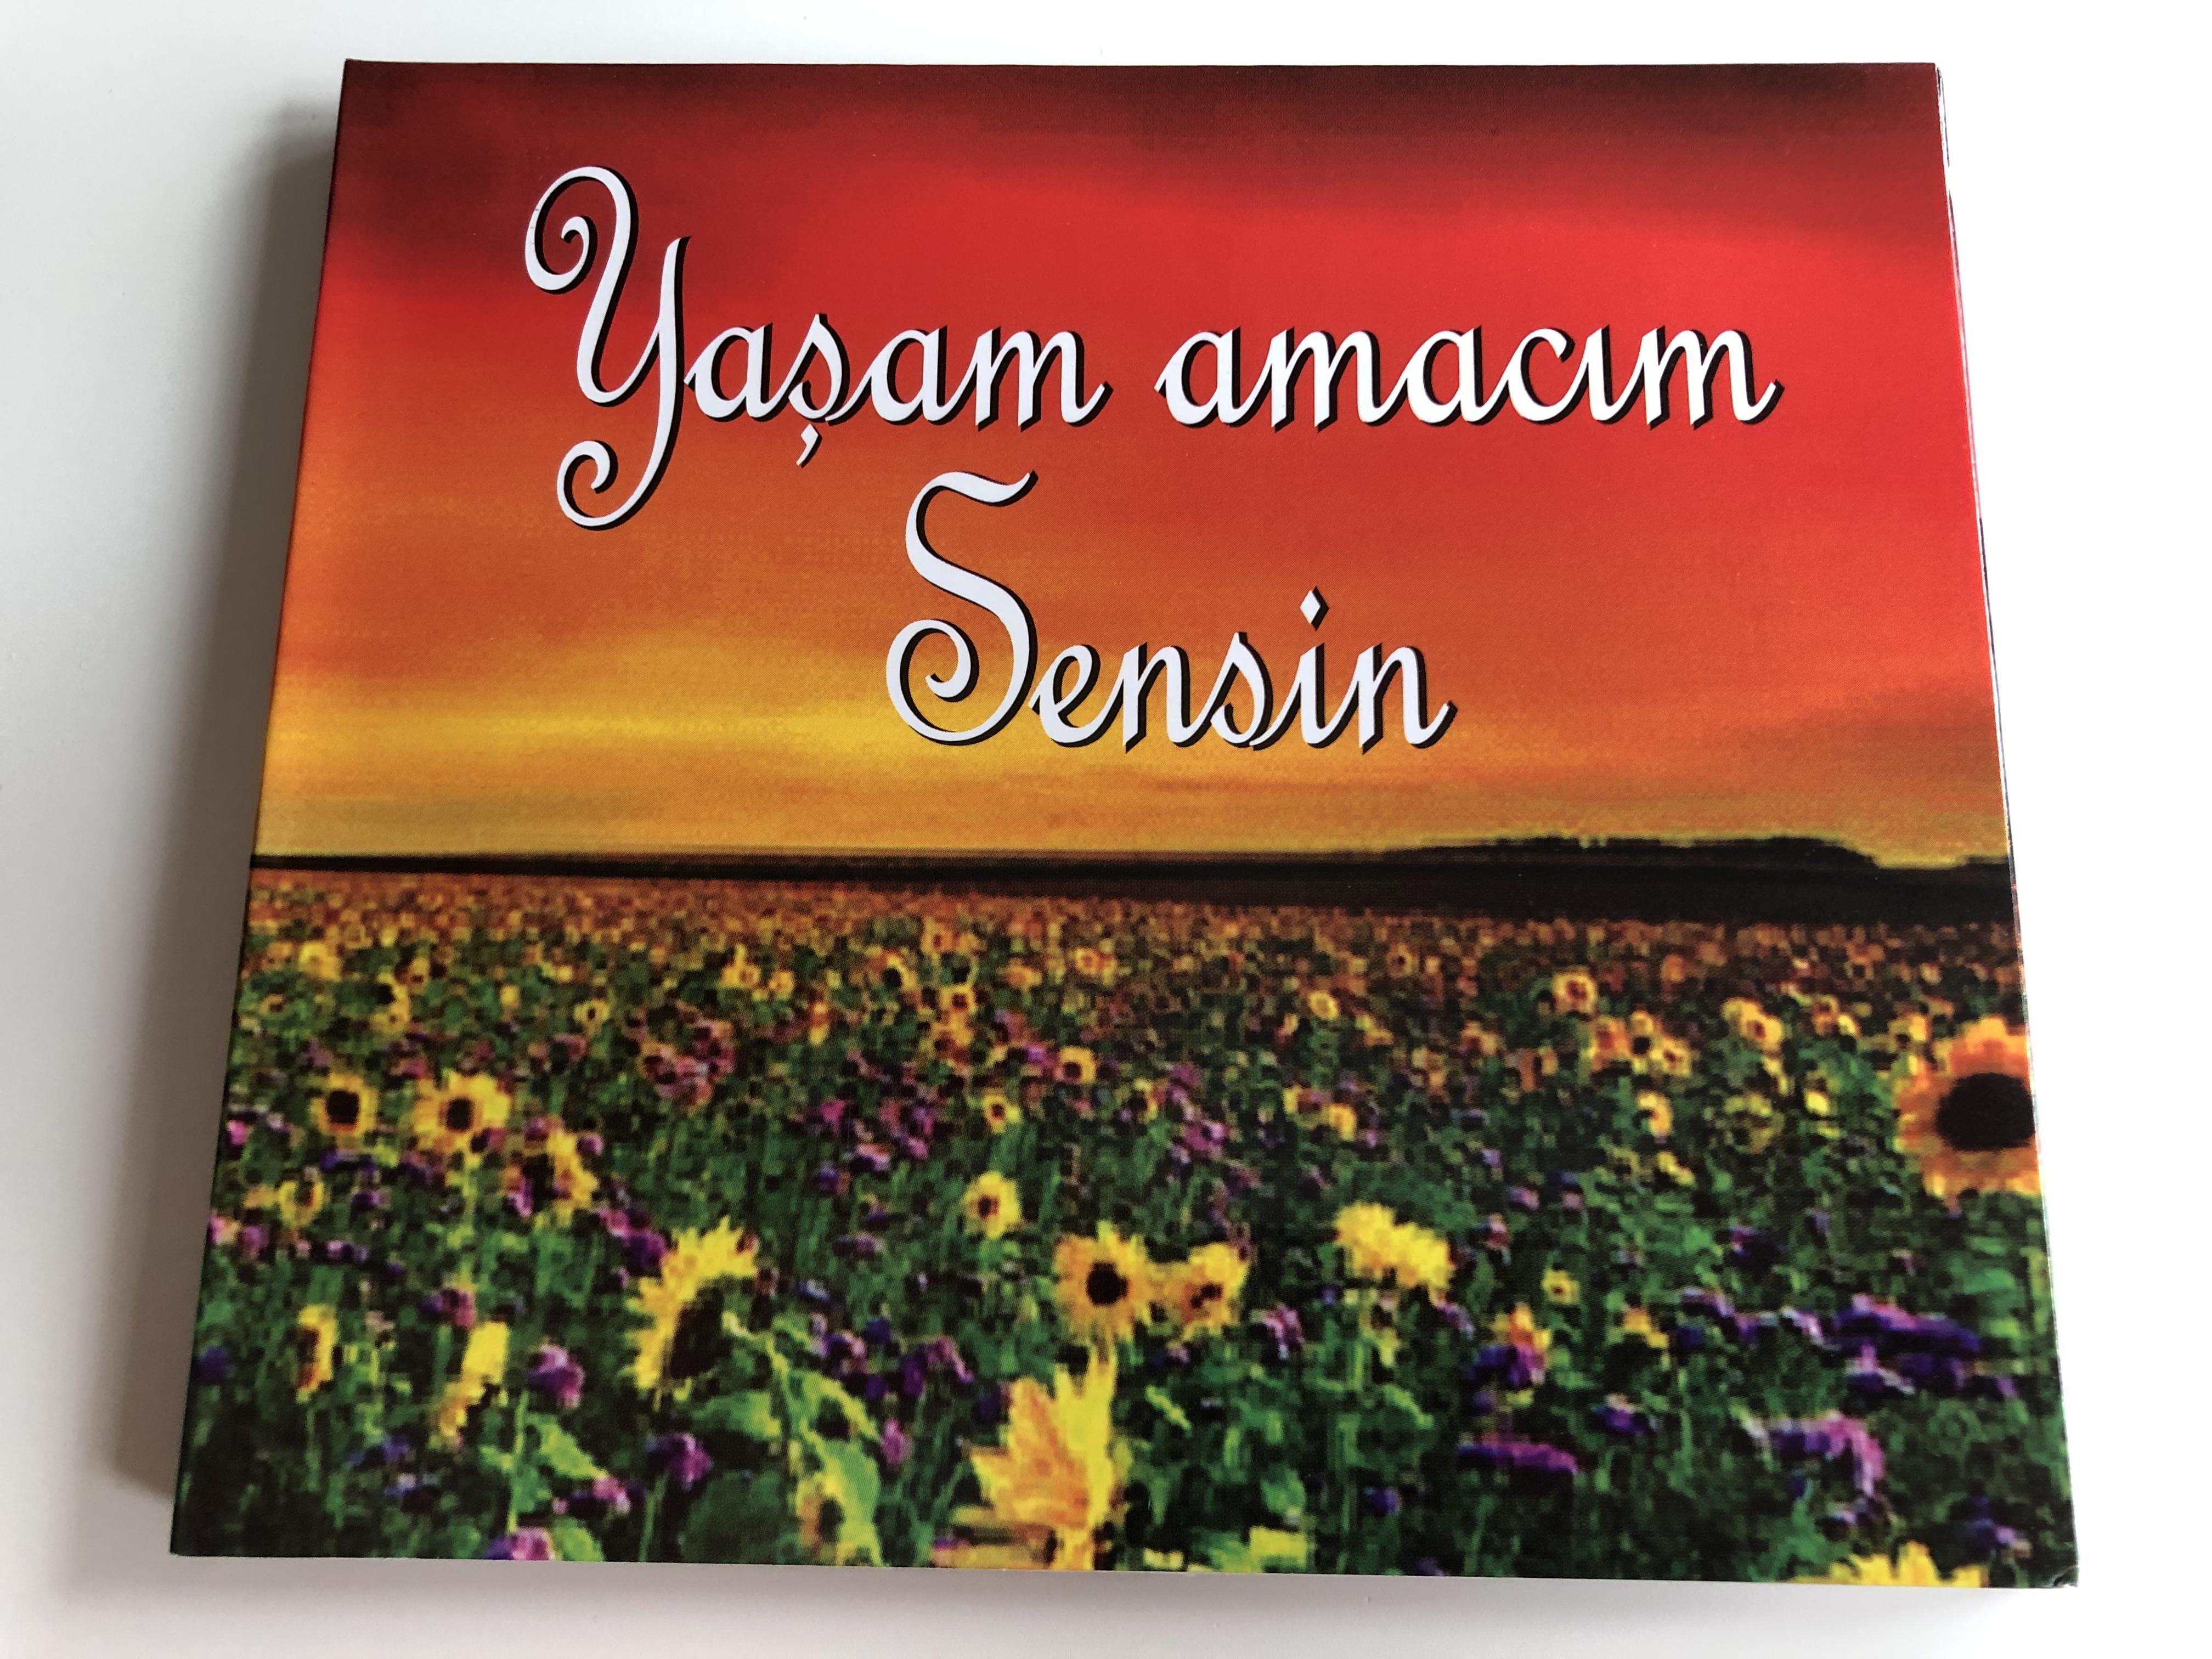 ya-am-amac-m-sensin-you-are-my-purpose-for-living-turkish-cd-turkish-christian-worship-and-praises-ufuk-demirgil-ali-yazar-umut-tanya-aldemir-edip-avcioglu-ali-vek-1-.jpg